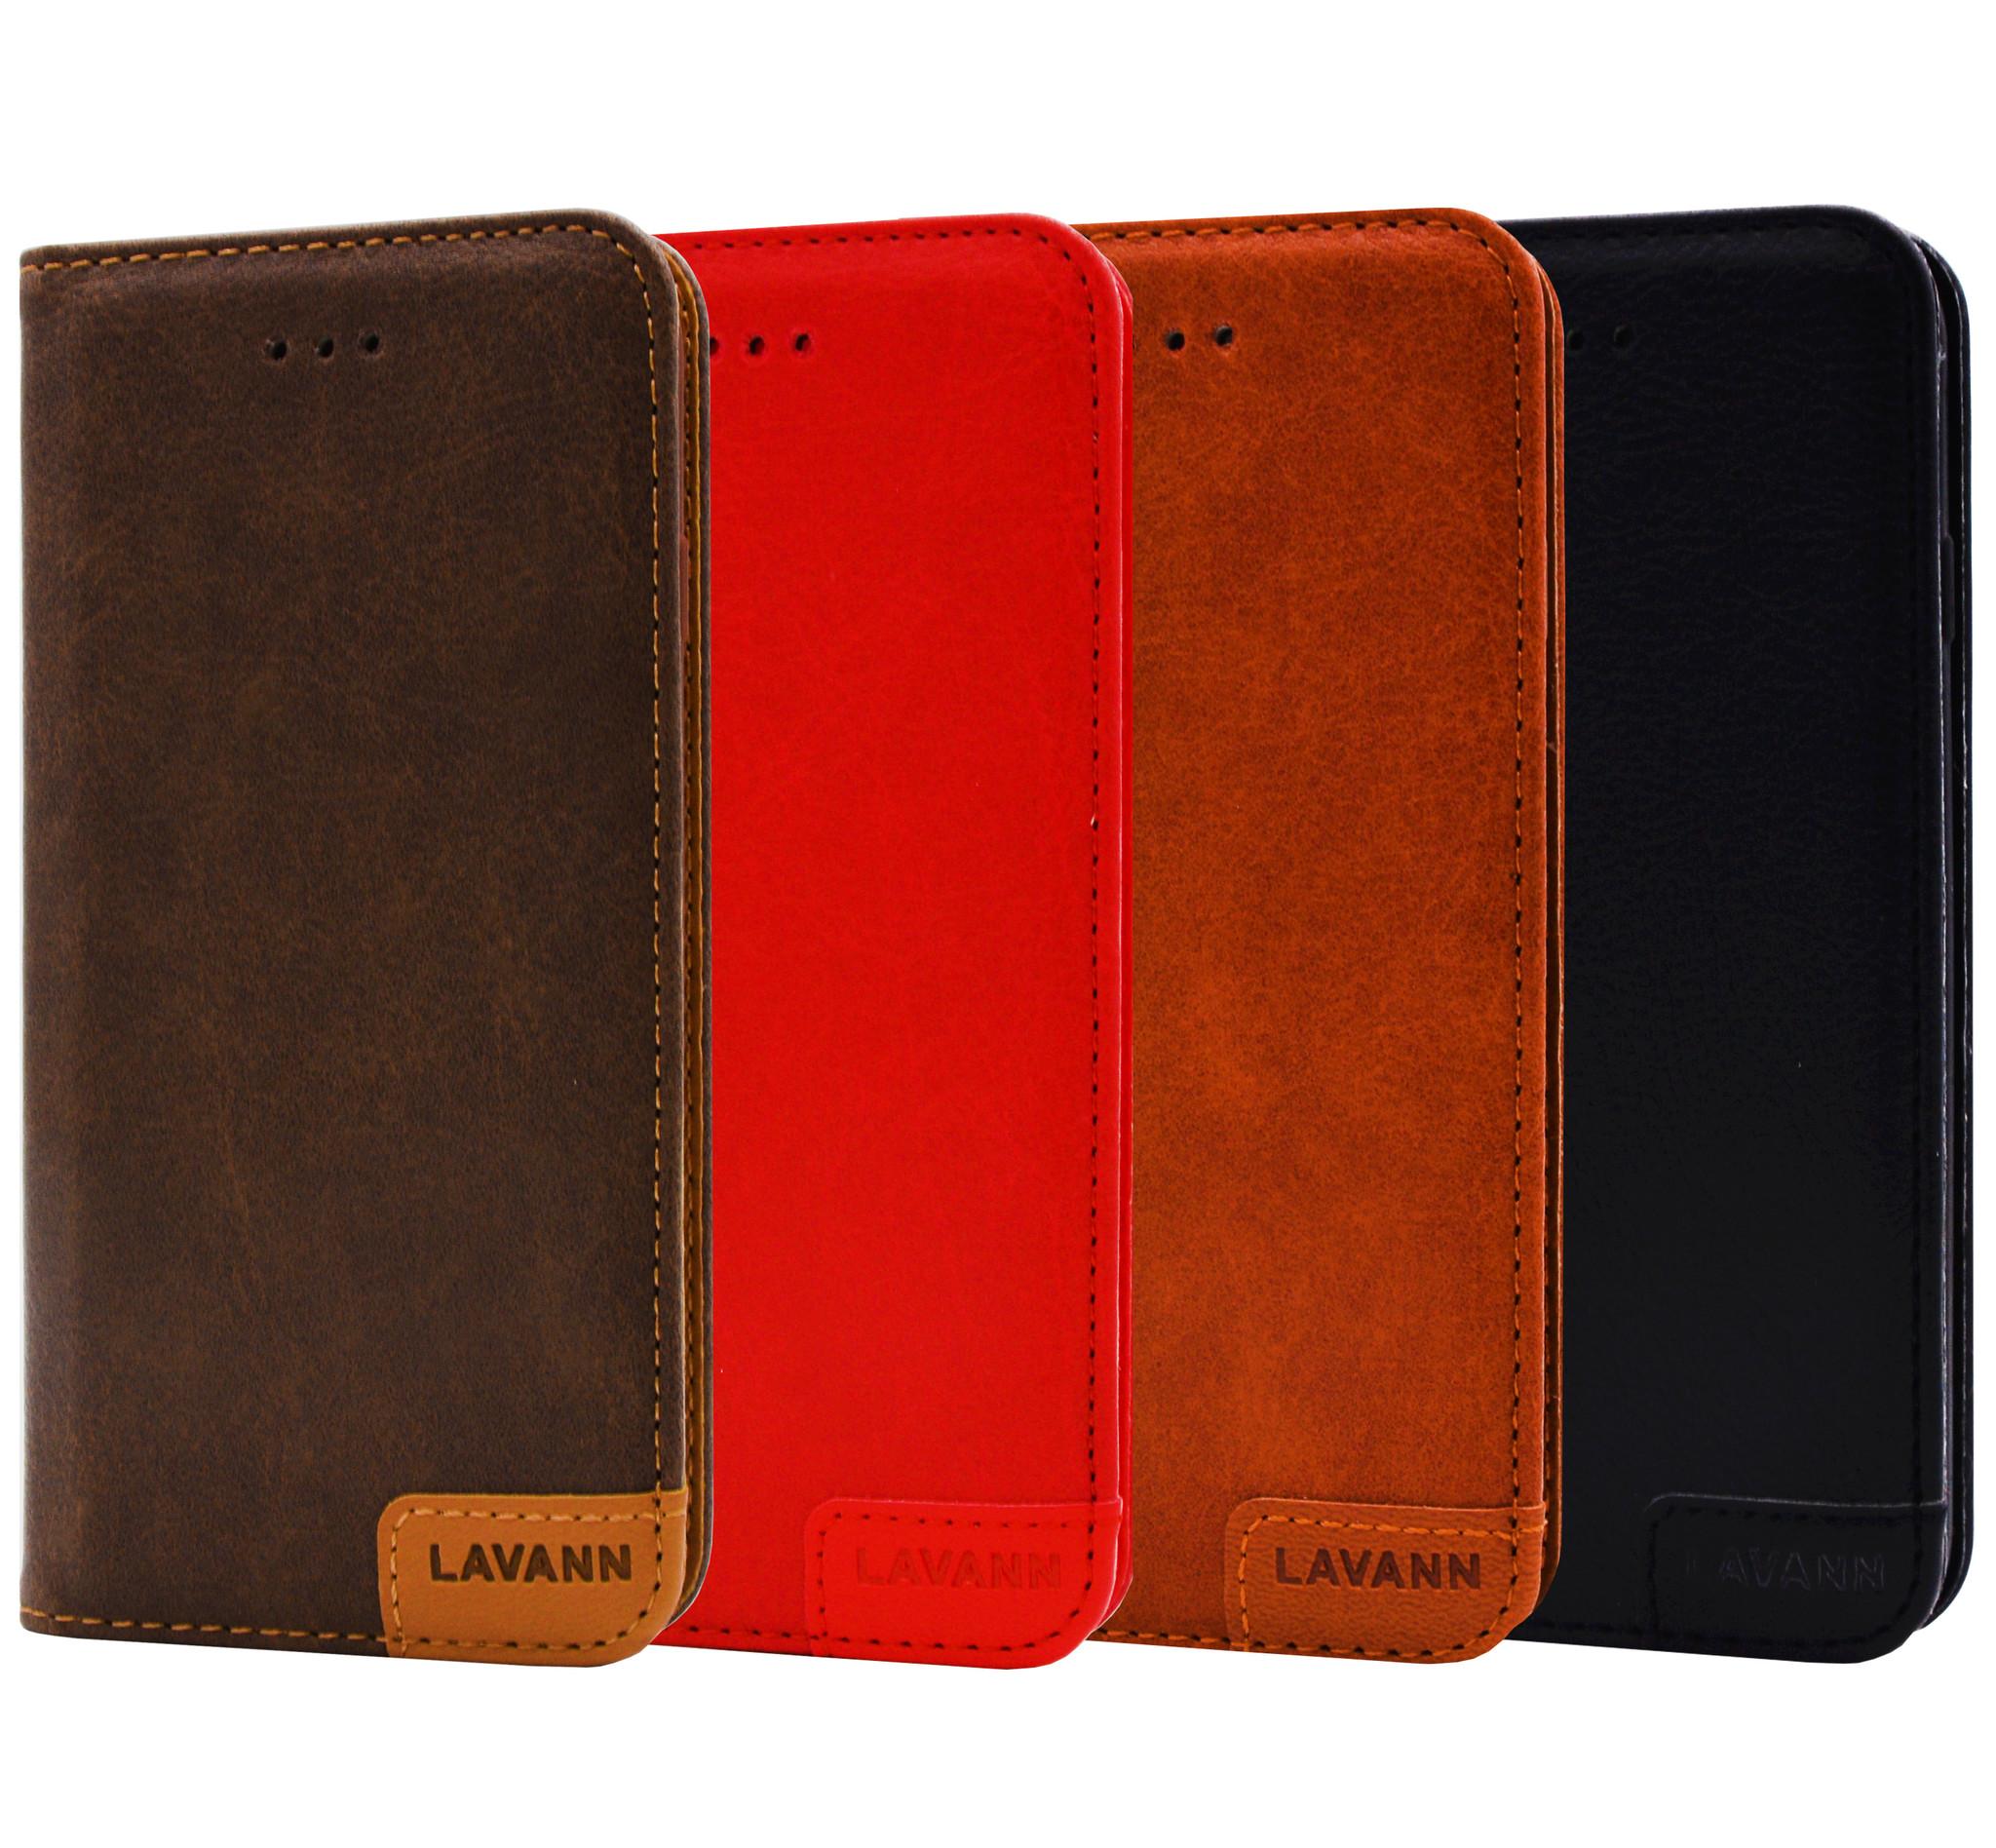 Lavann Lavann Leather Bookcase Galaxy A42